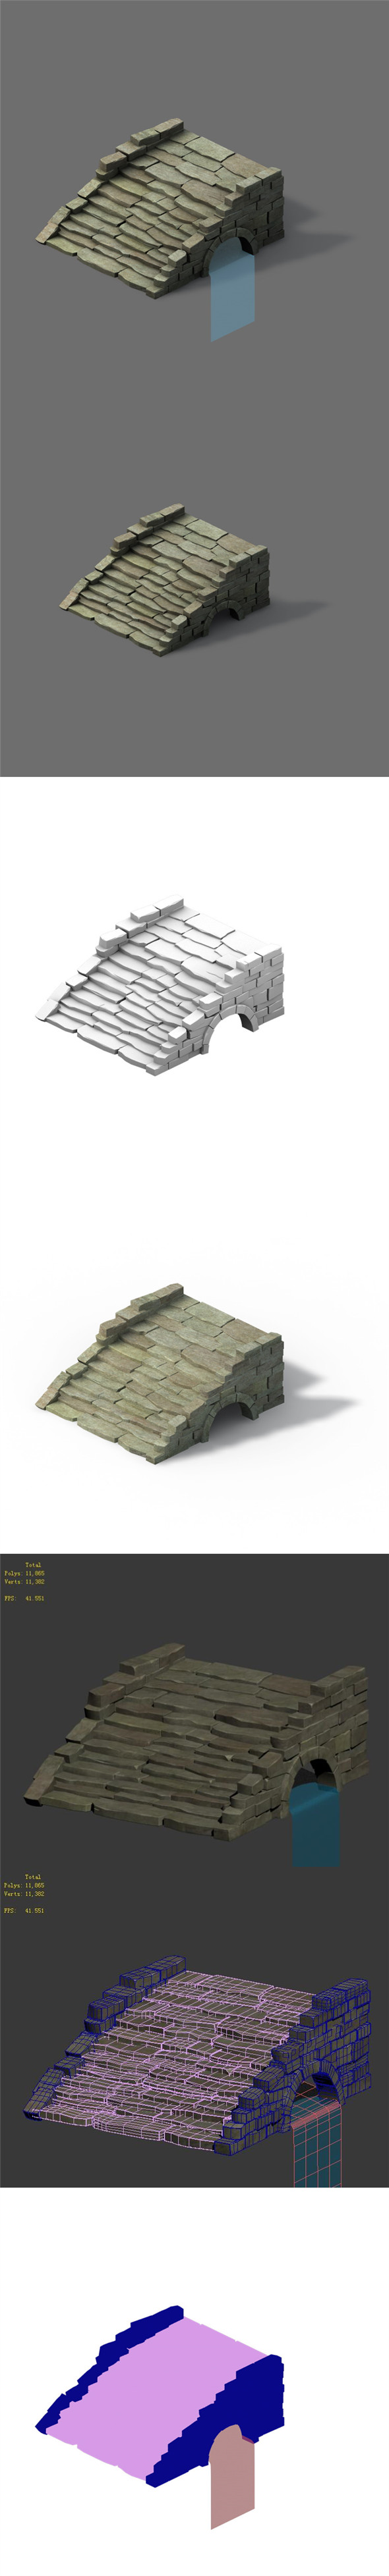 Mountain - terrain stone staircase 03 - 3DOcean Item for Sale